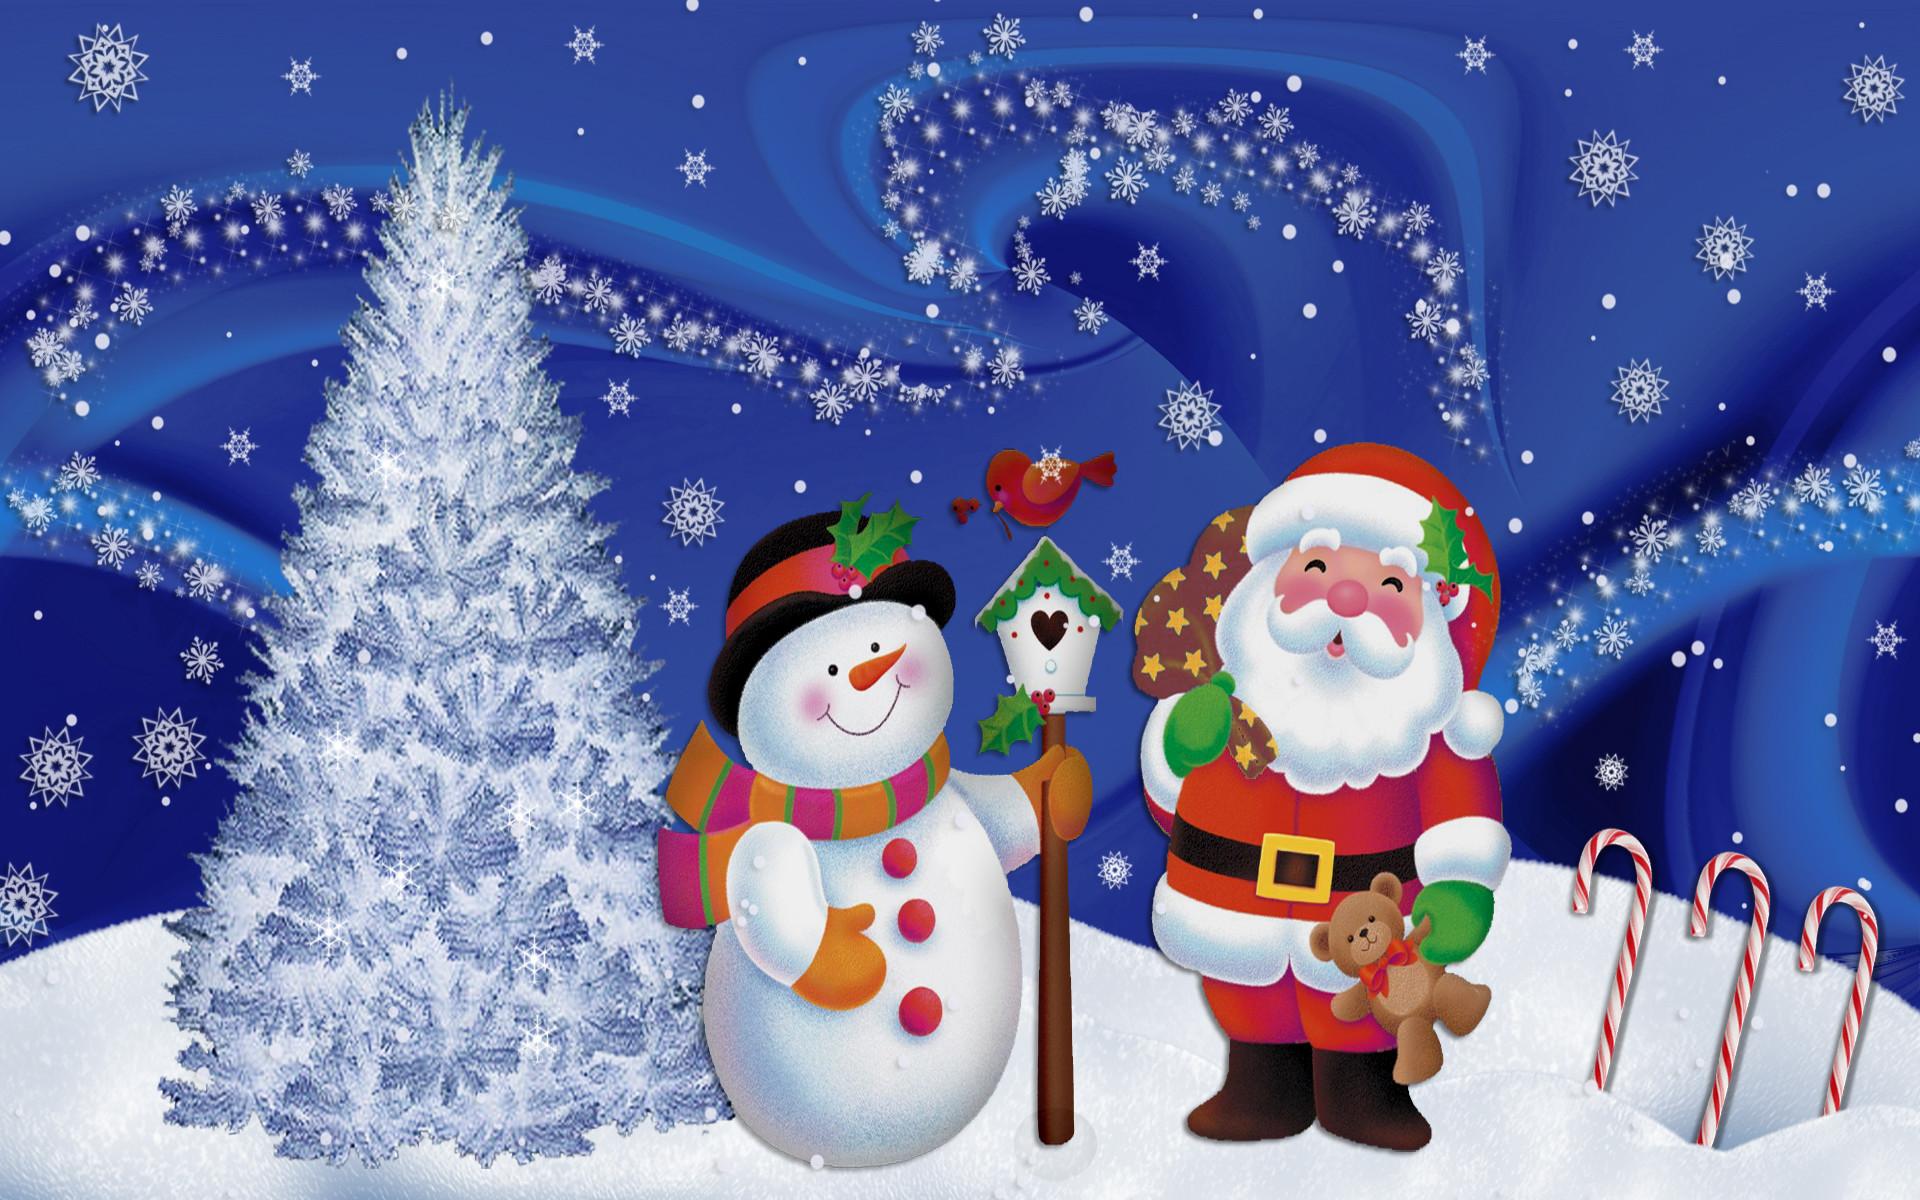 Christmas Wallpapers For Desktop – Beautiful Wallpaper